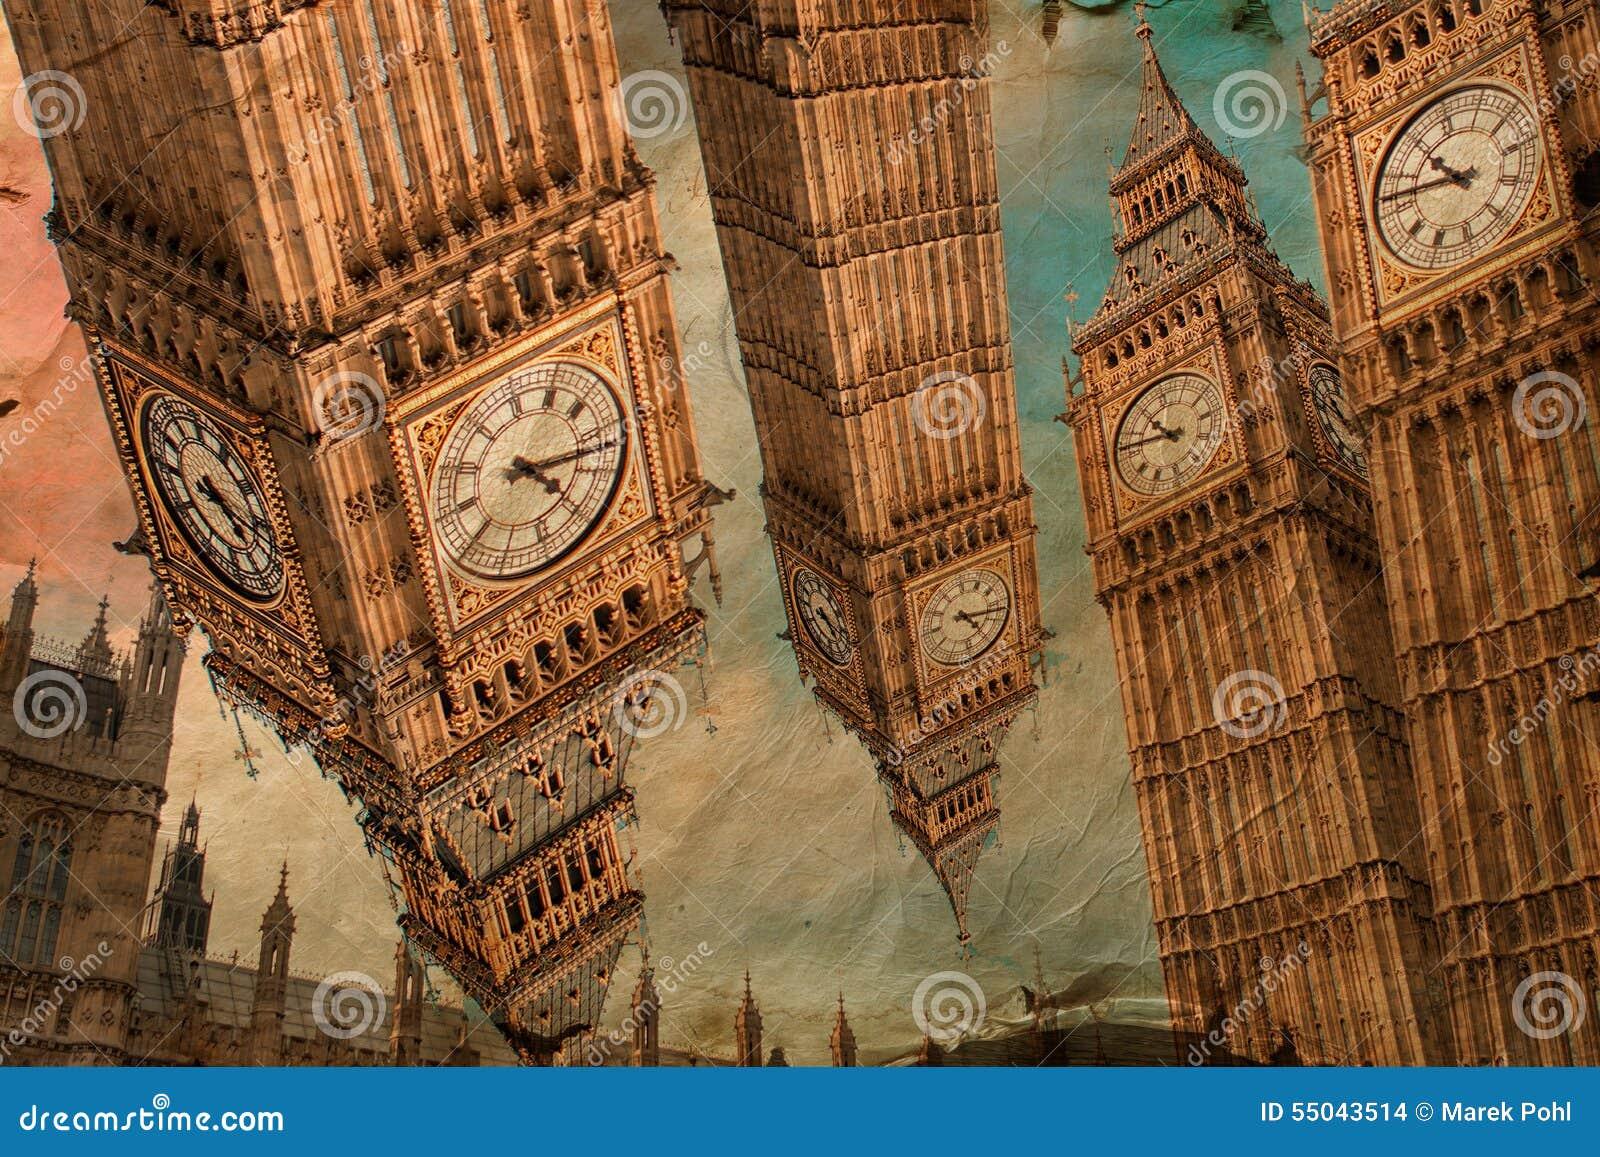 Big Ben London Digital Art Stock Photo Image 55043514